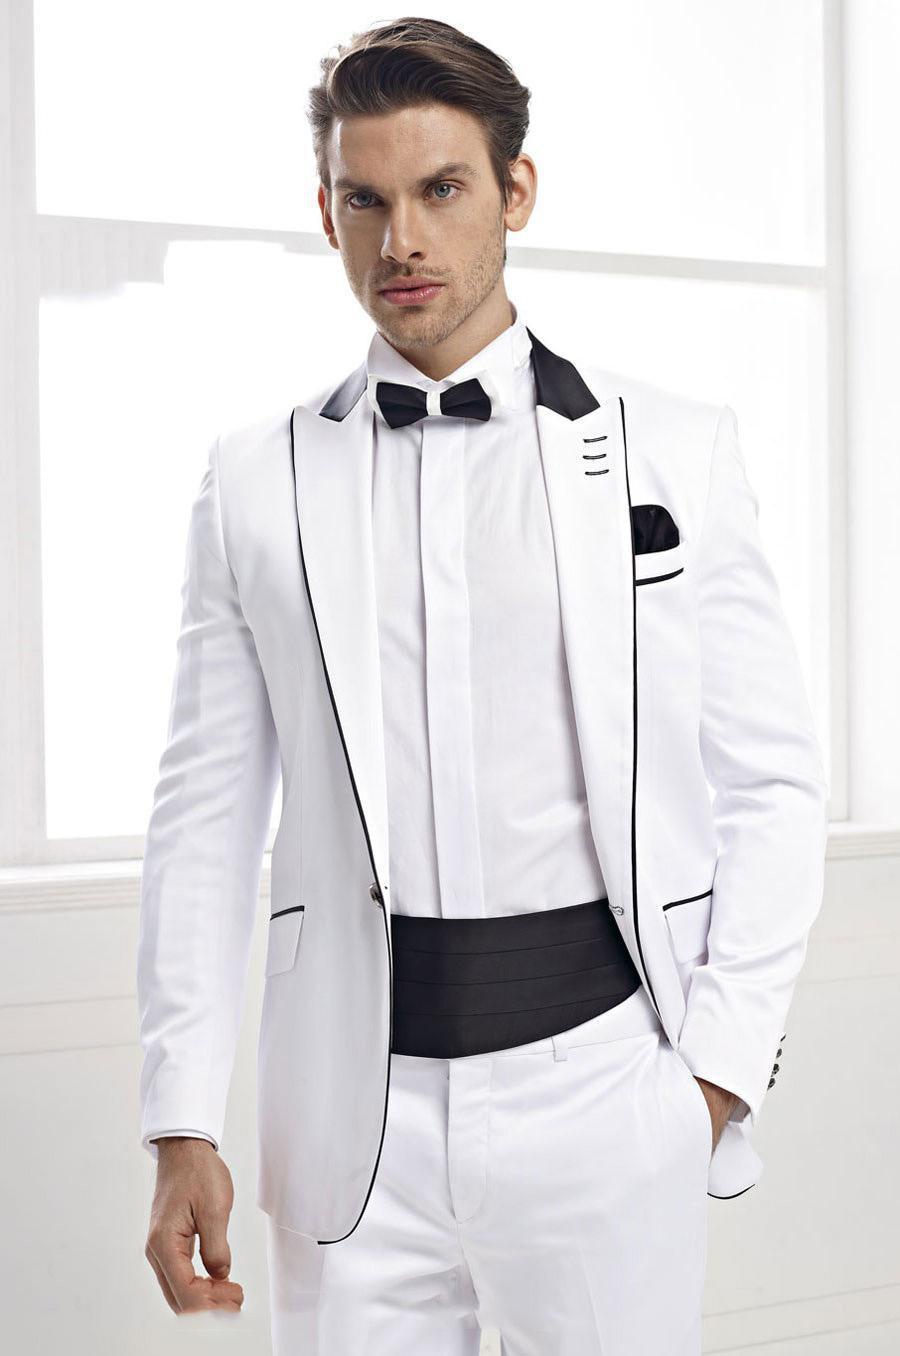 Custom Made New Arrival Groom Tuxedos,Slim Fit Party Suit Groomsman Suit Mens Suit (Jacket+Pants+Tie+Shirt) Bridegroom Suit